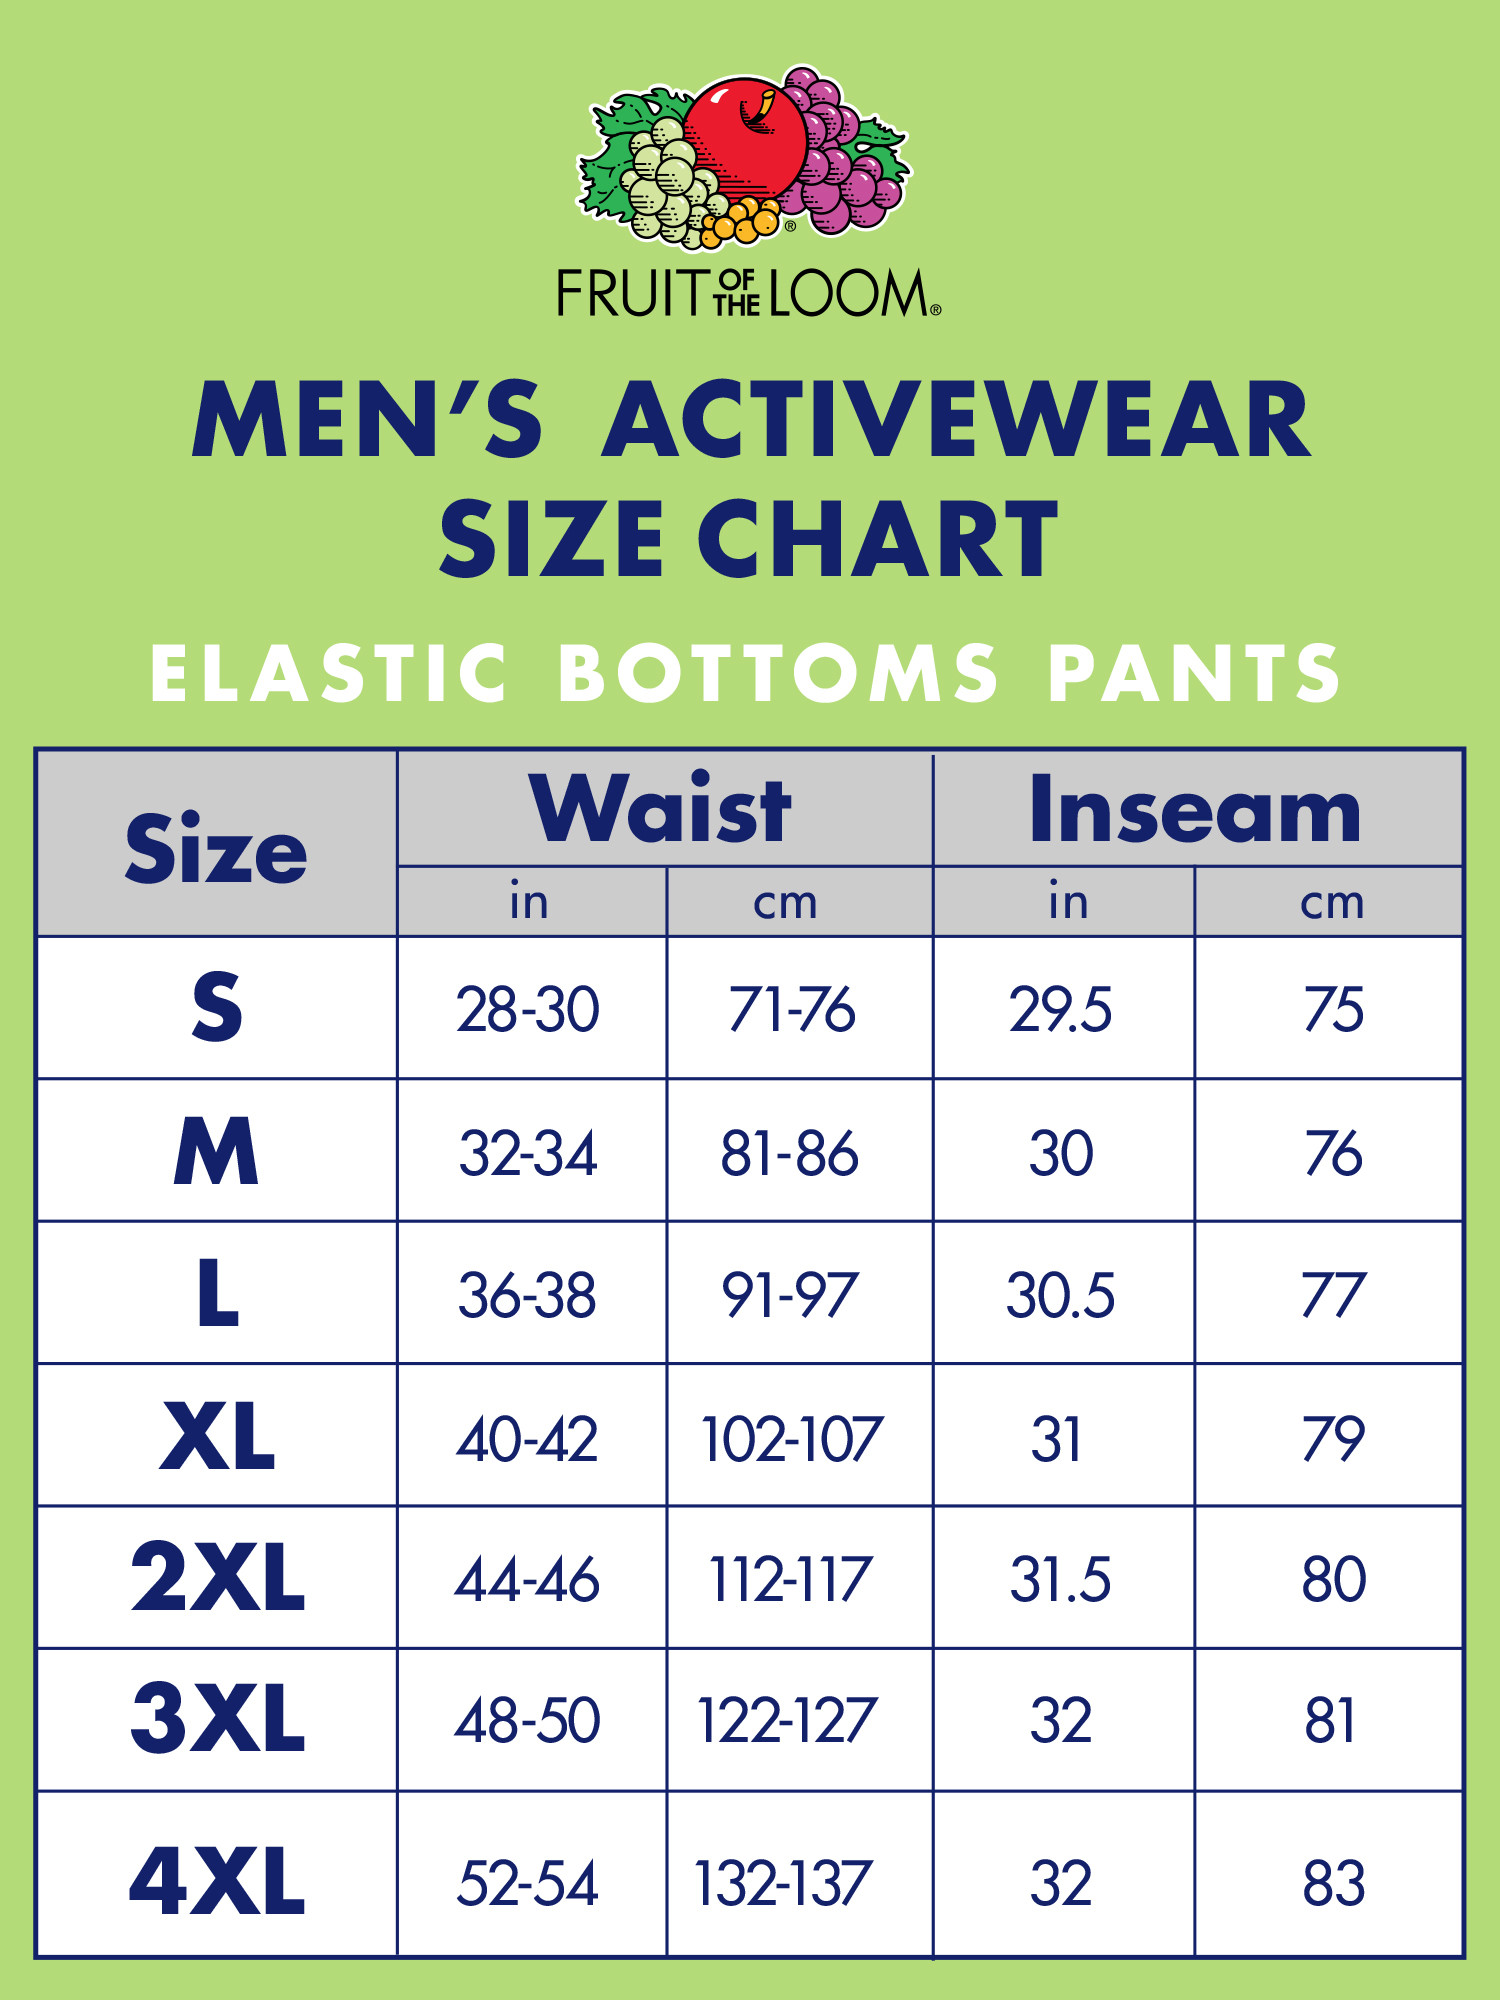 Remontarse Móvil Por  كفالة كتيب تستهلك nike sweatpants men's size chart - skazka-devonrex.com